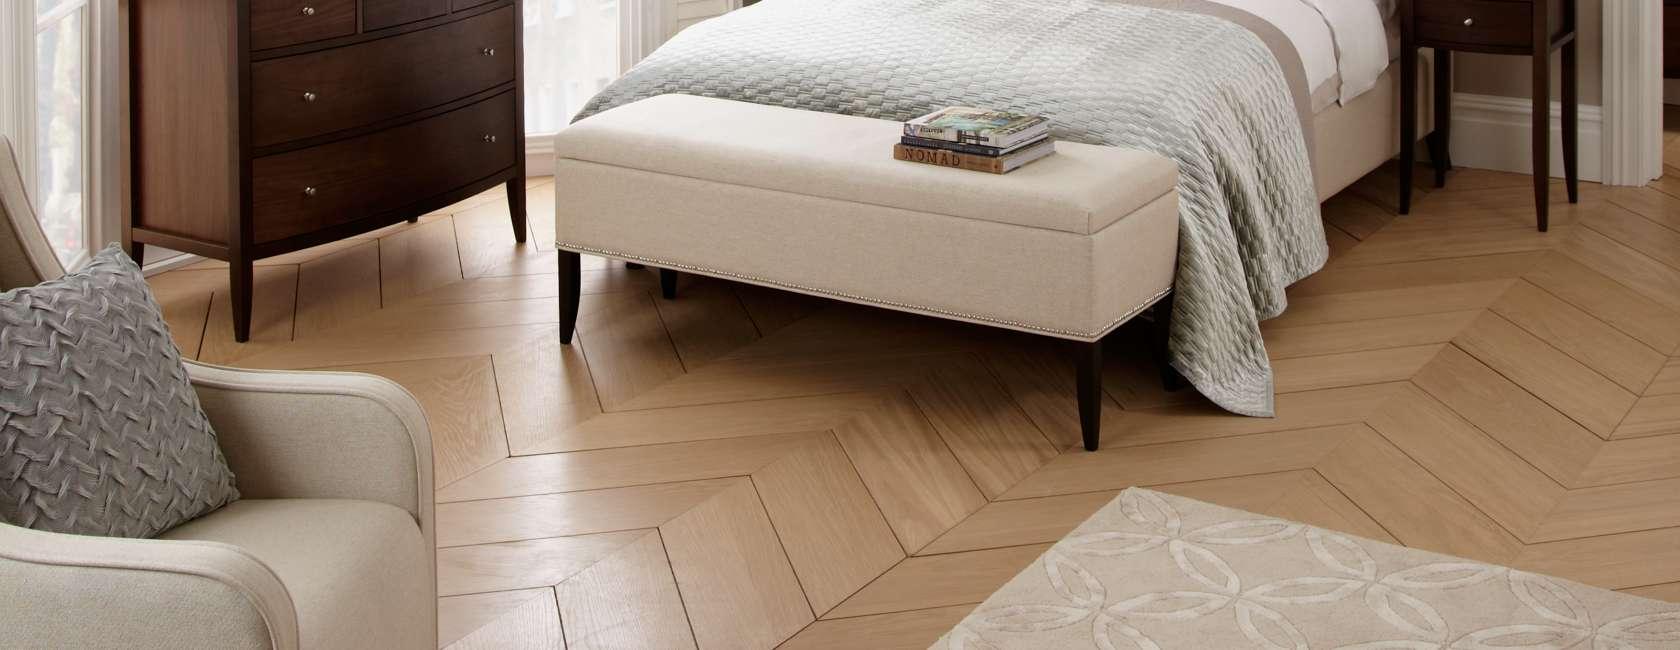 John Lewis & Partners Jennifer Bedroom Furniture at John Lewis